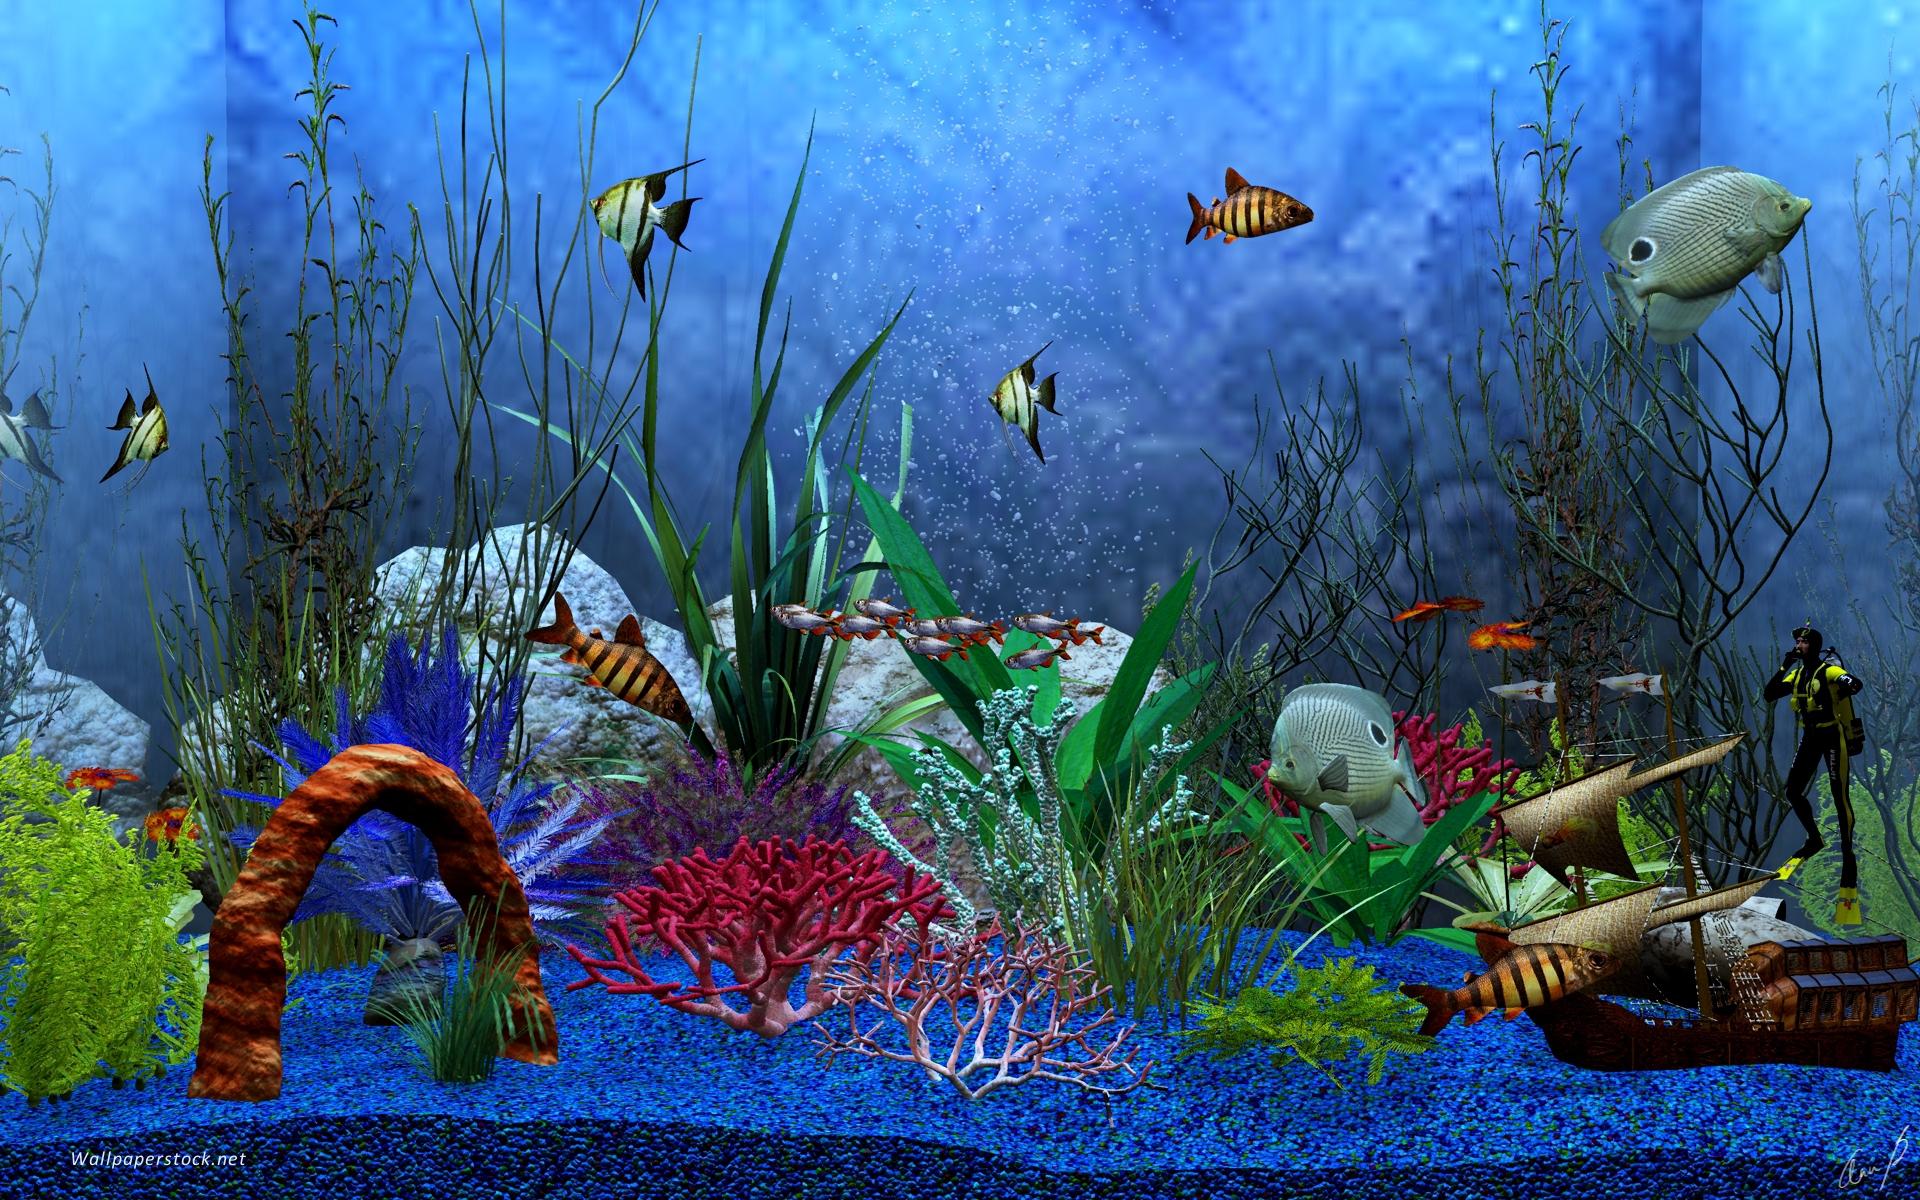 Animated Aquarium Desktop Wallpaper   wwwwallpapers in hdcom 1920x1200